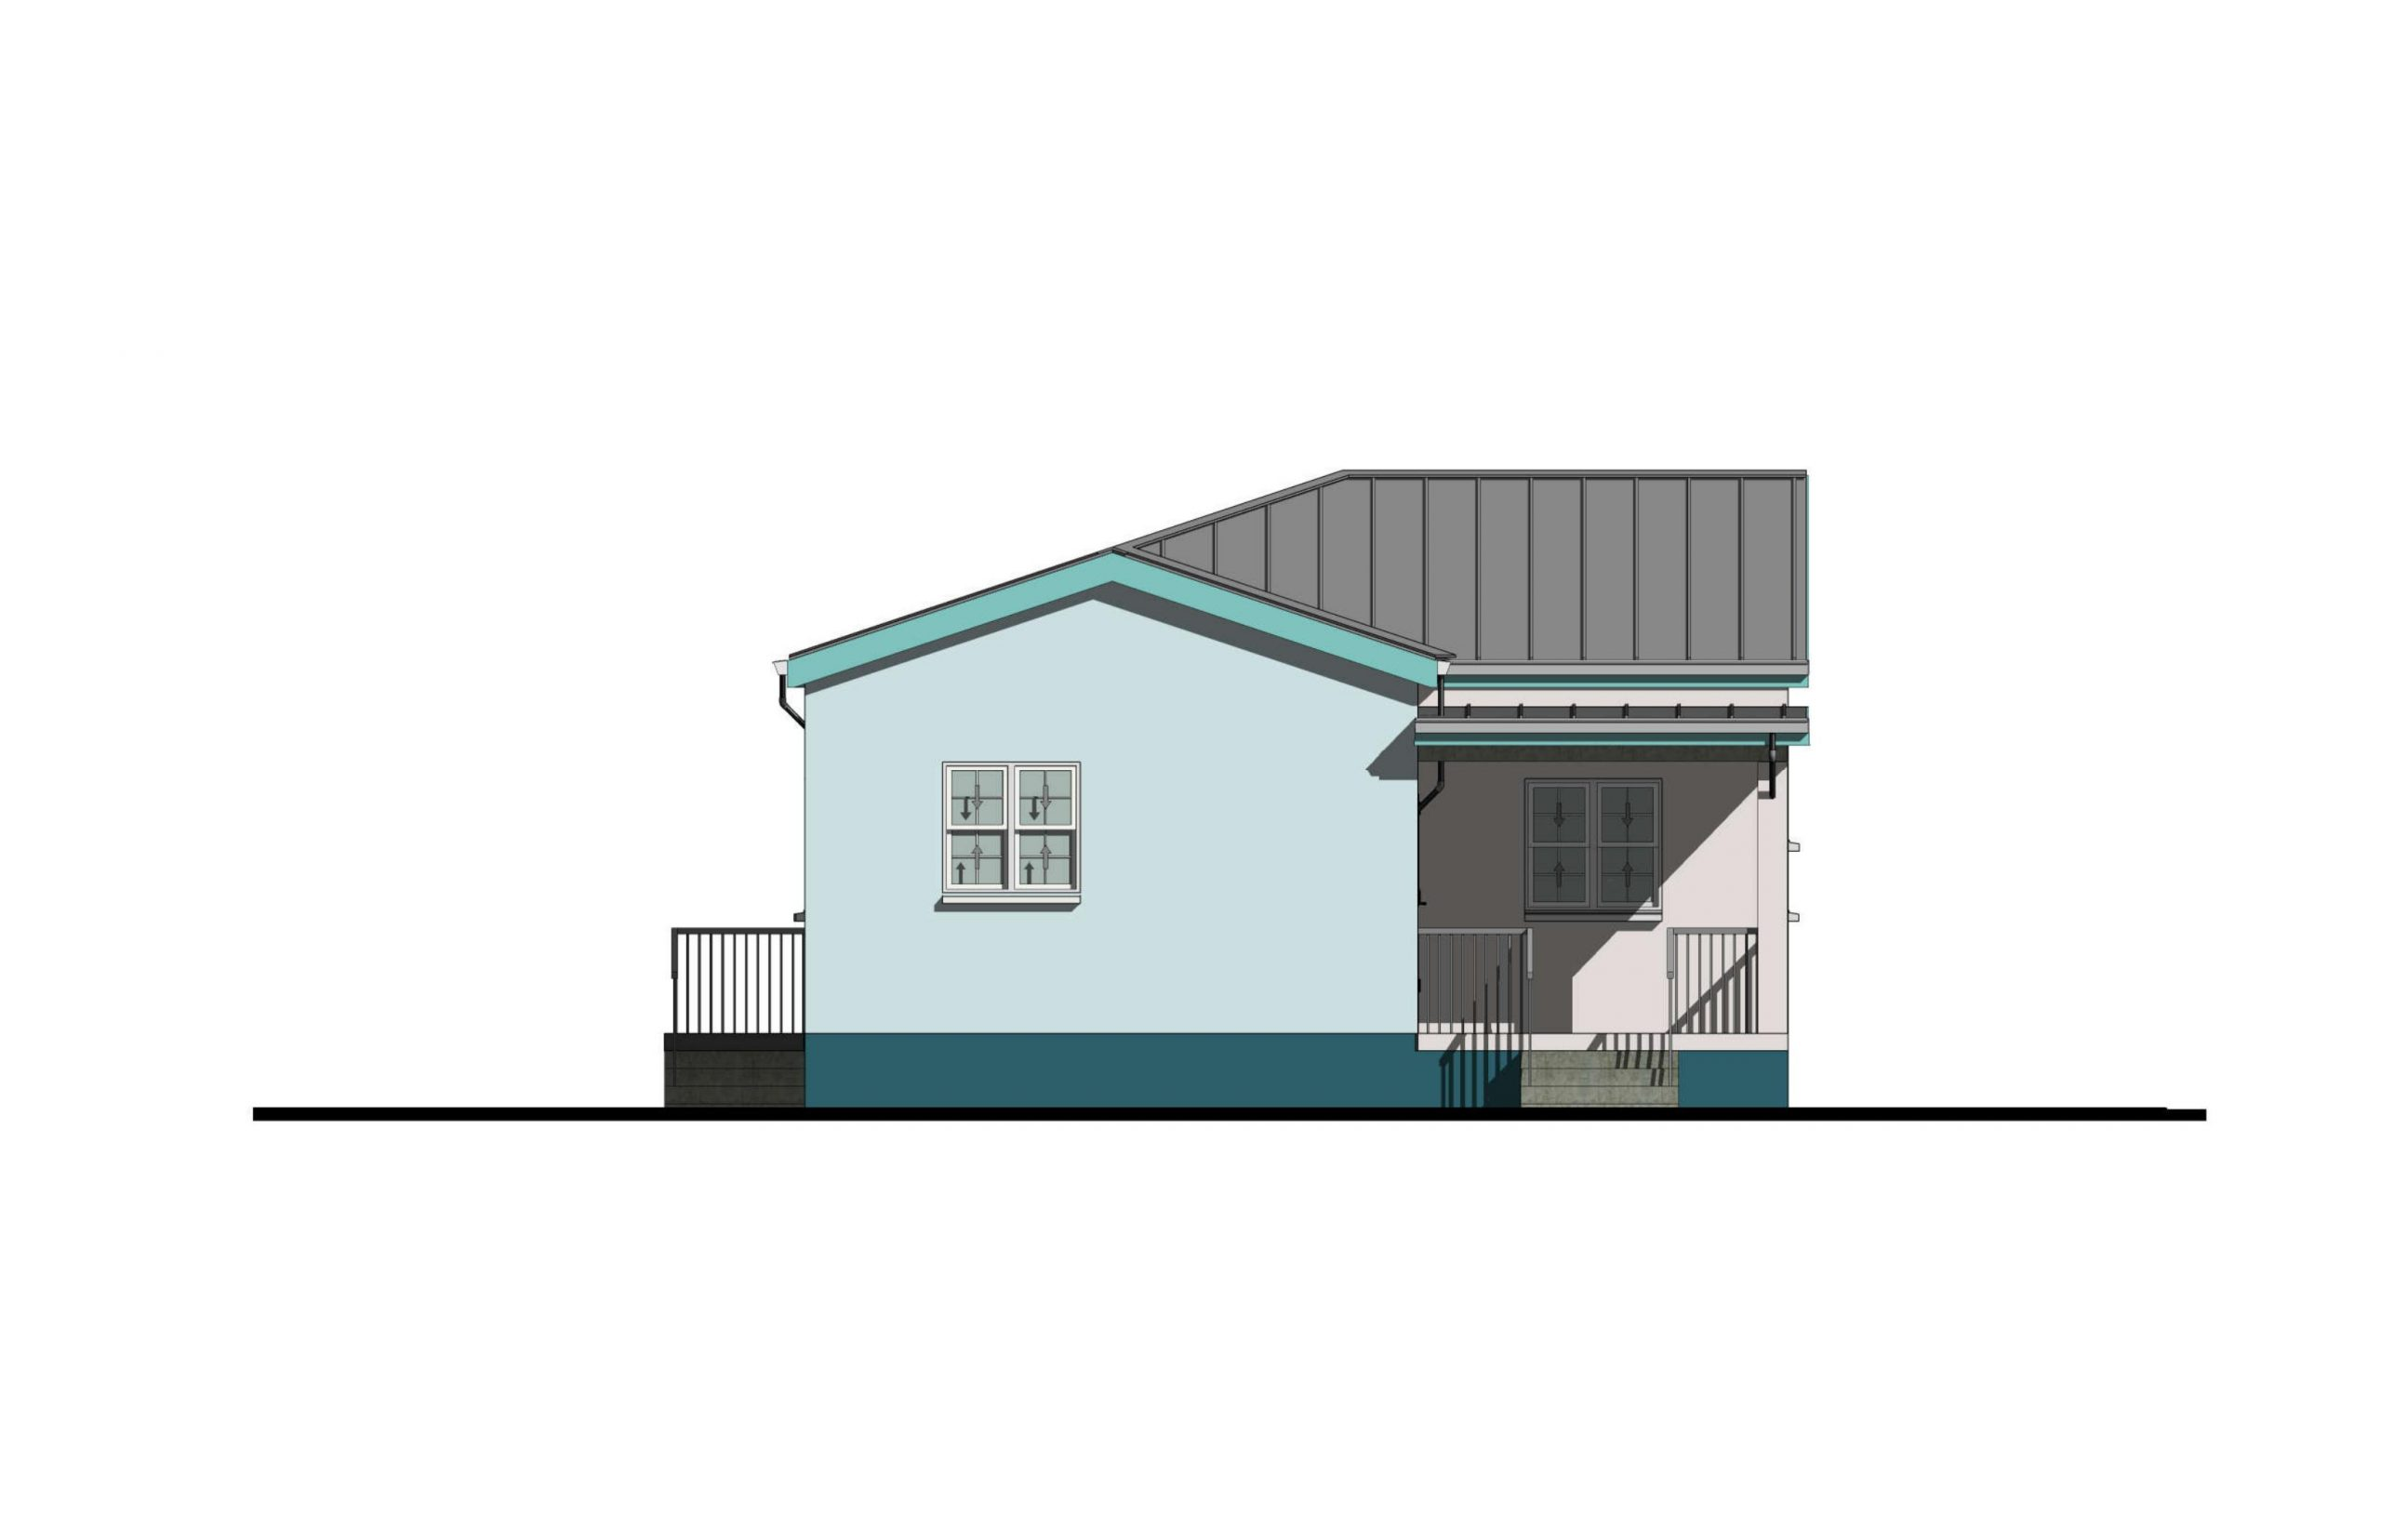 Lodestar 3 Bed  2Bath Option 1 Front Elevation  1060+SQFT